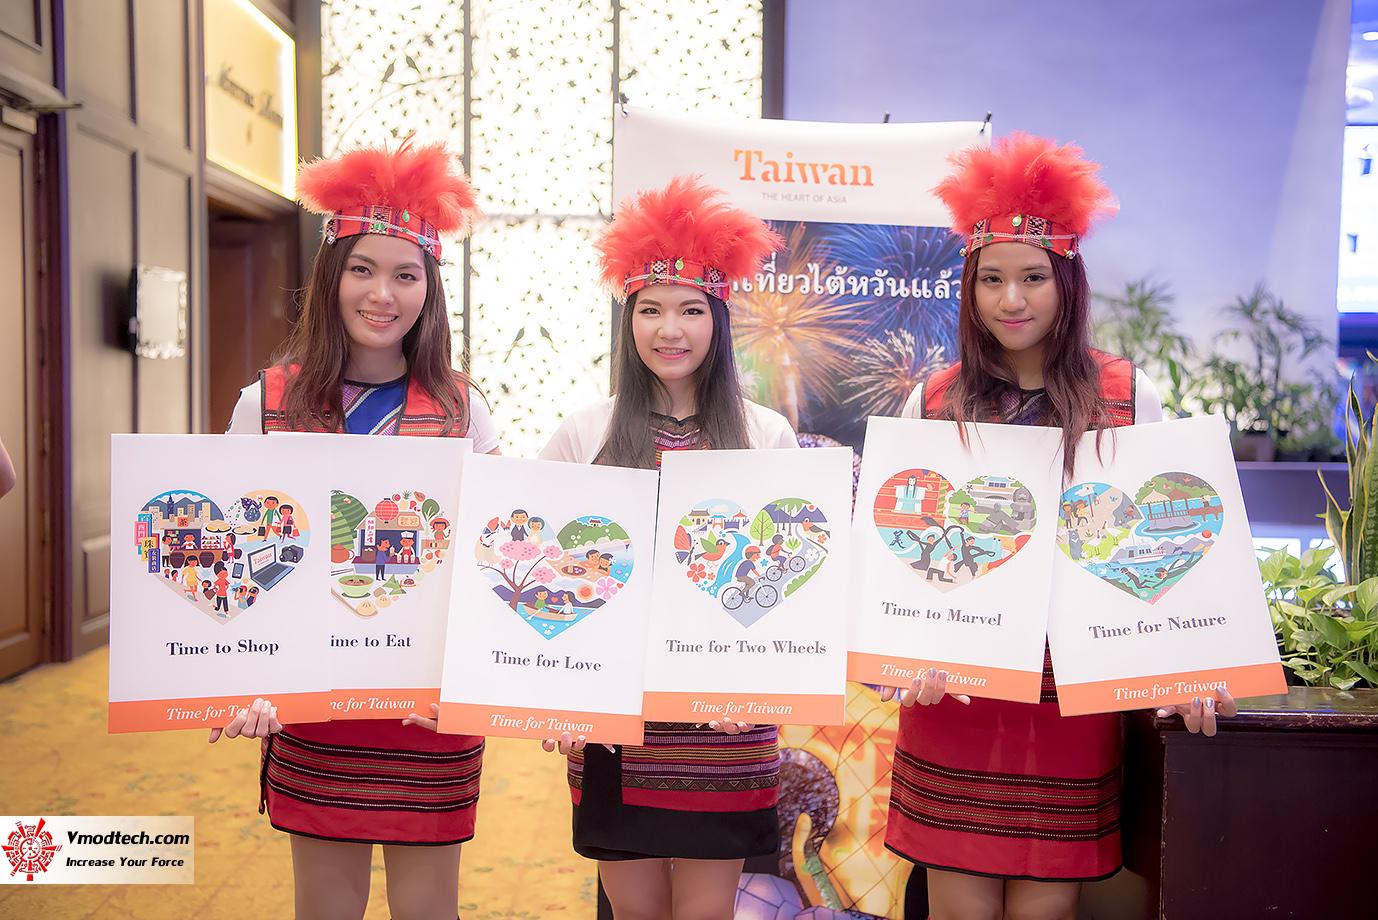 dsc 9429 ภาพบรรยากาศงาน Taiwan Tourism ภายในงาน Thai International Travel Fair 2016